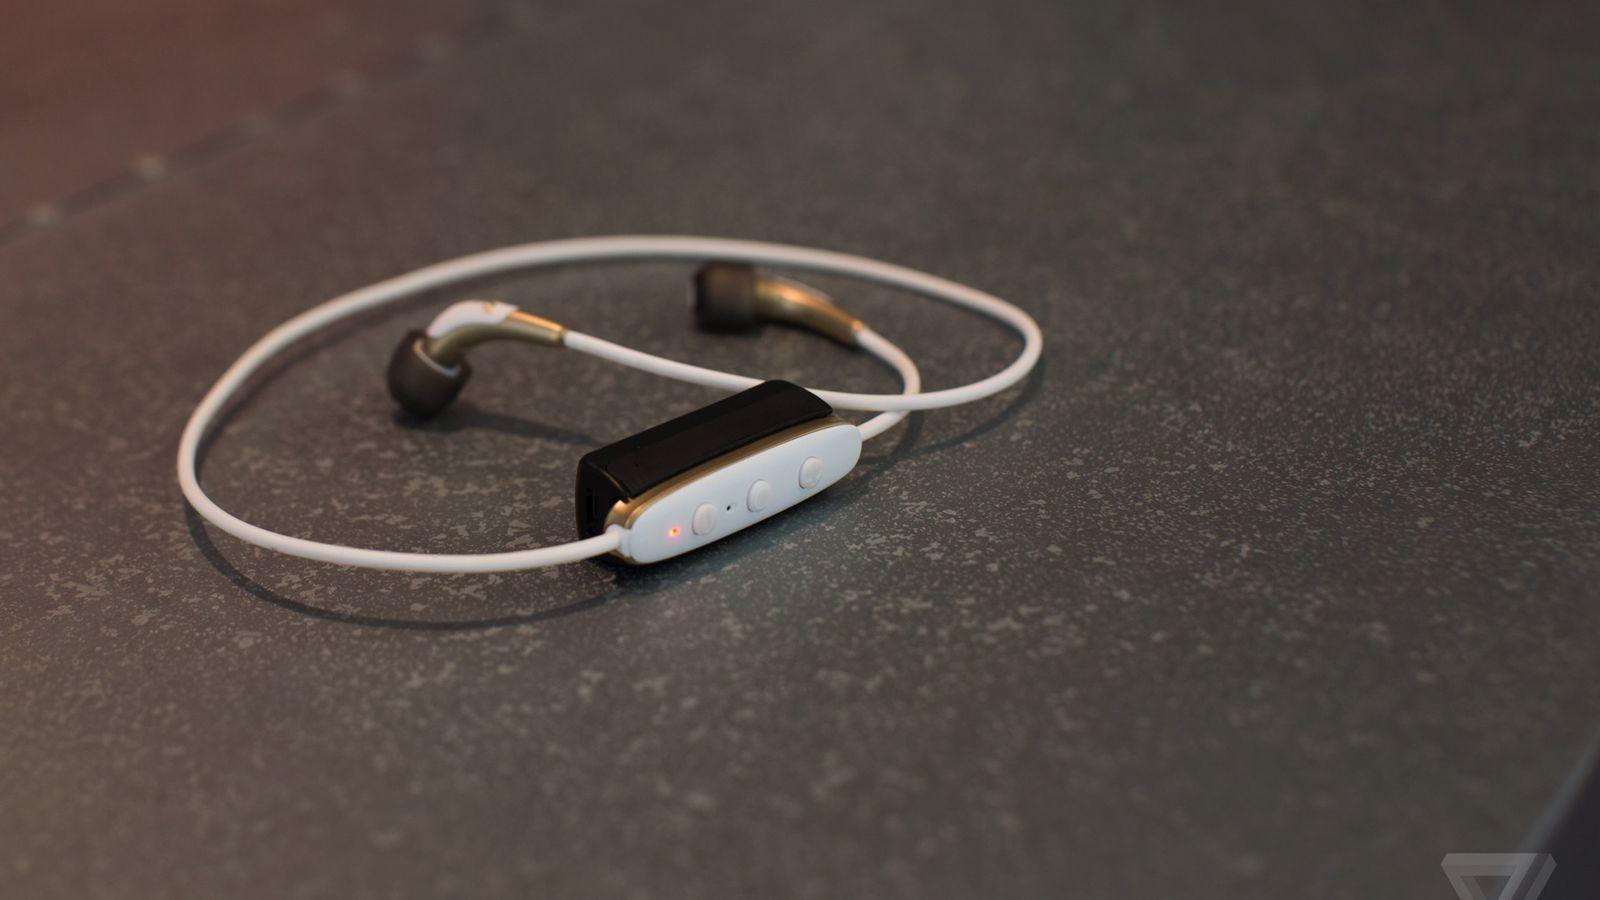 Bluetooth headphones are annoying - The Verge